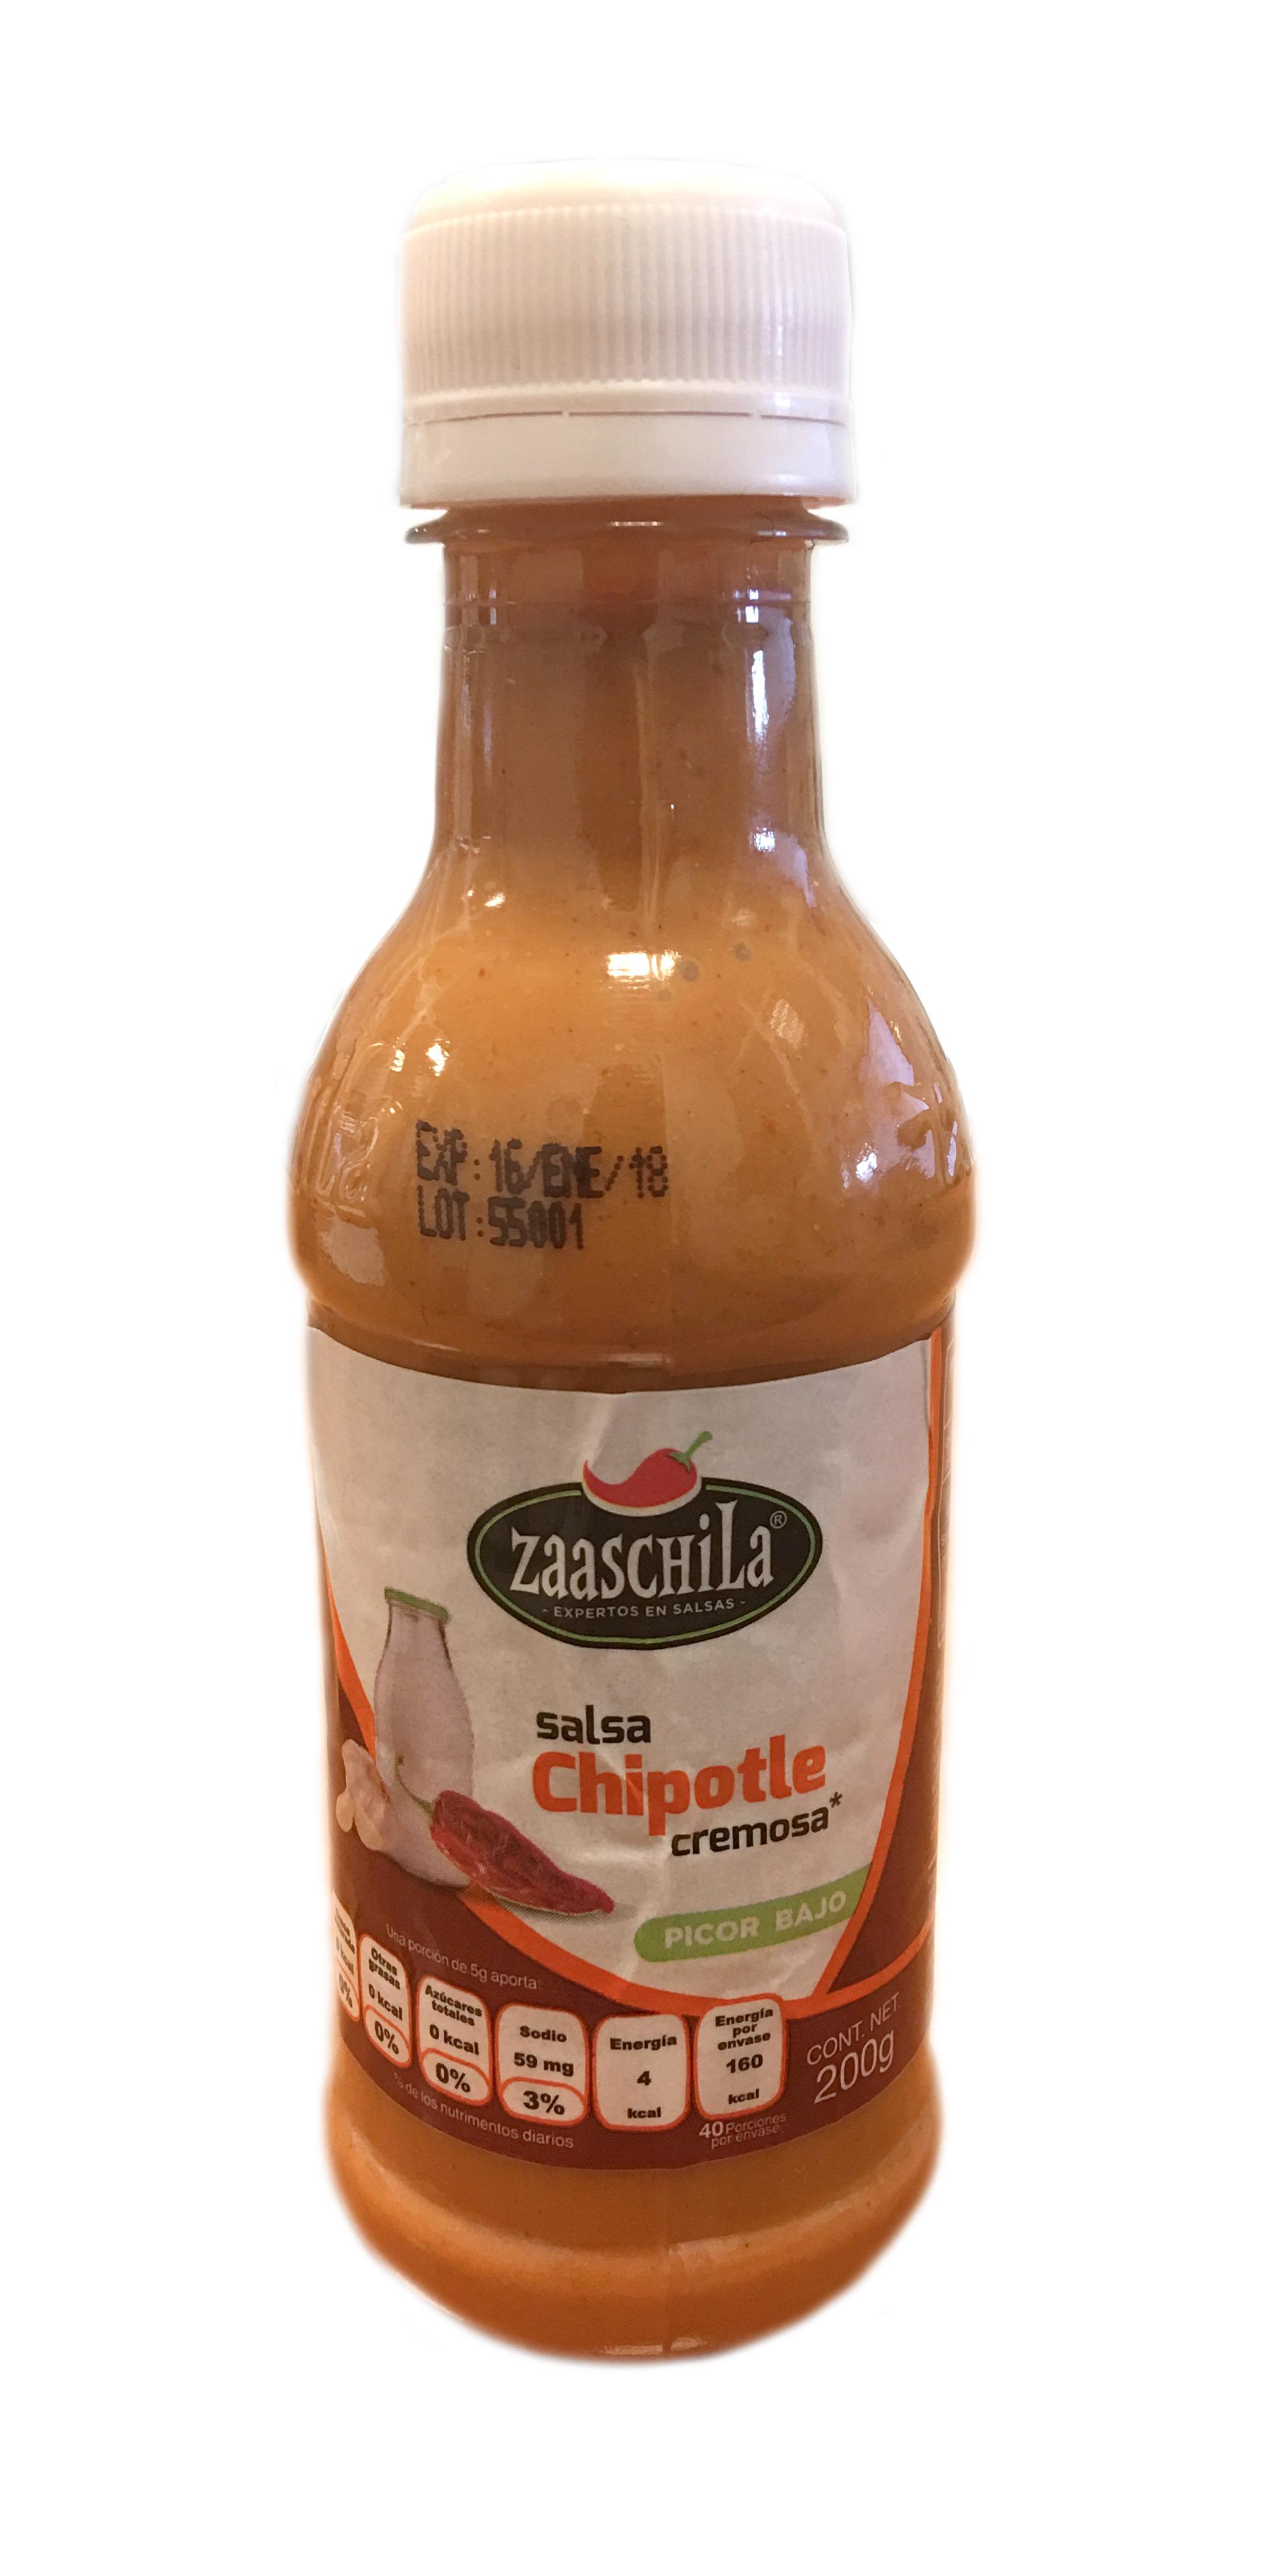 Salsa cremosa Chipotle Zaaschila 200g Botella Plástico